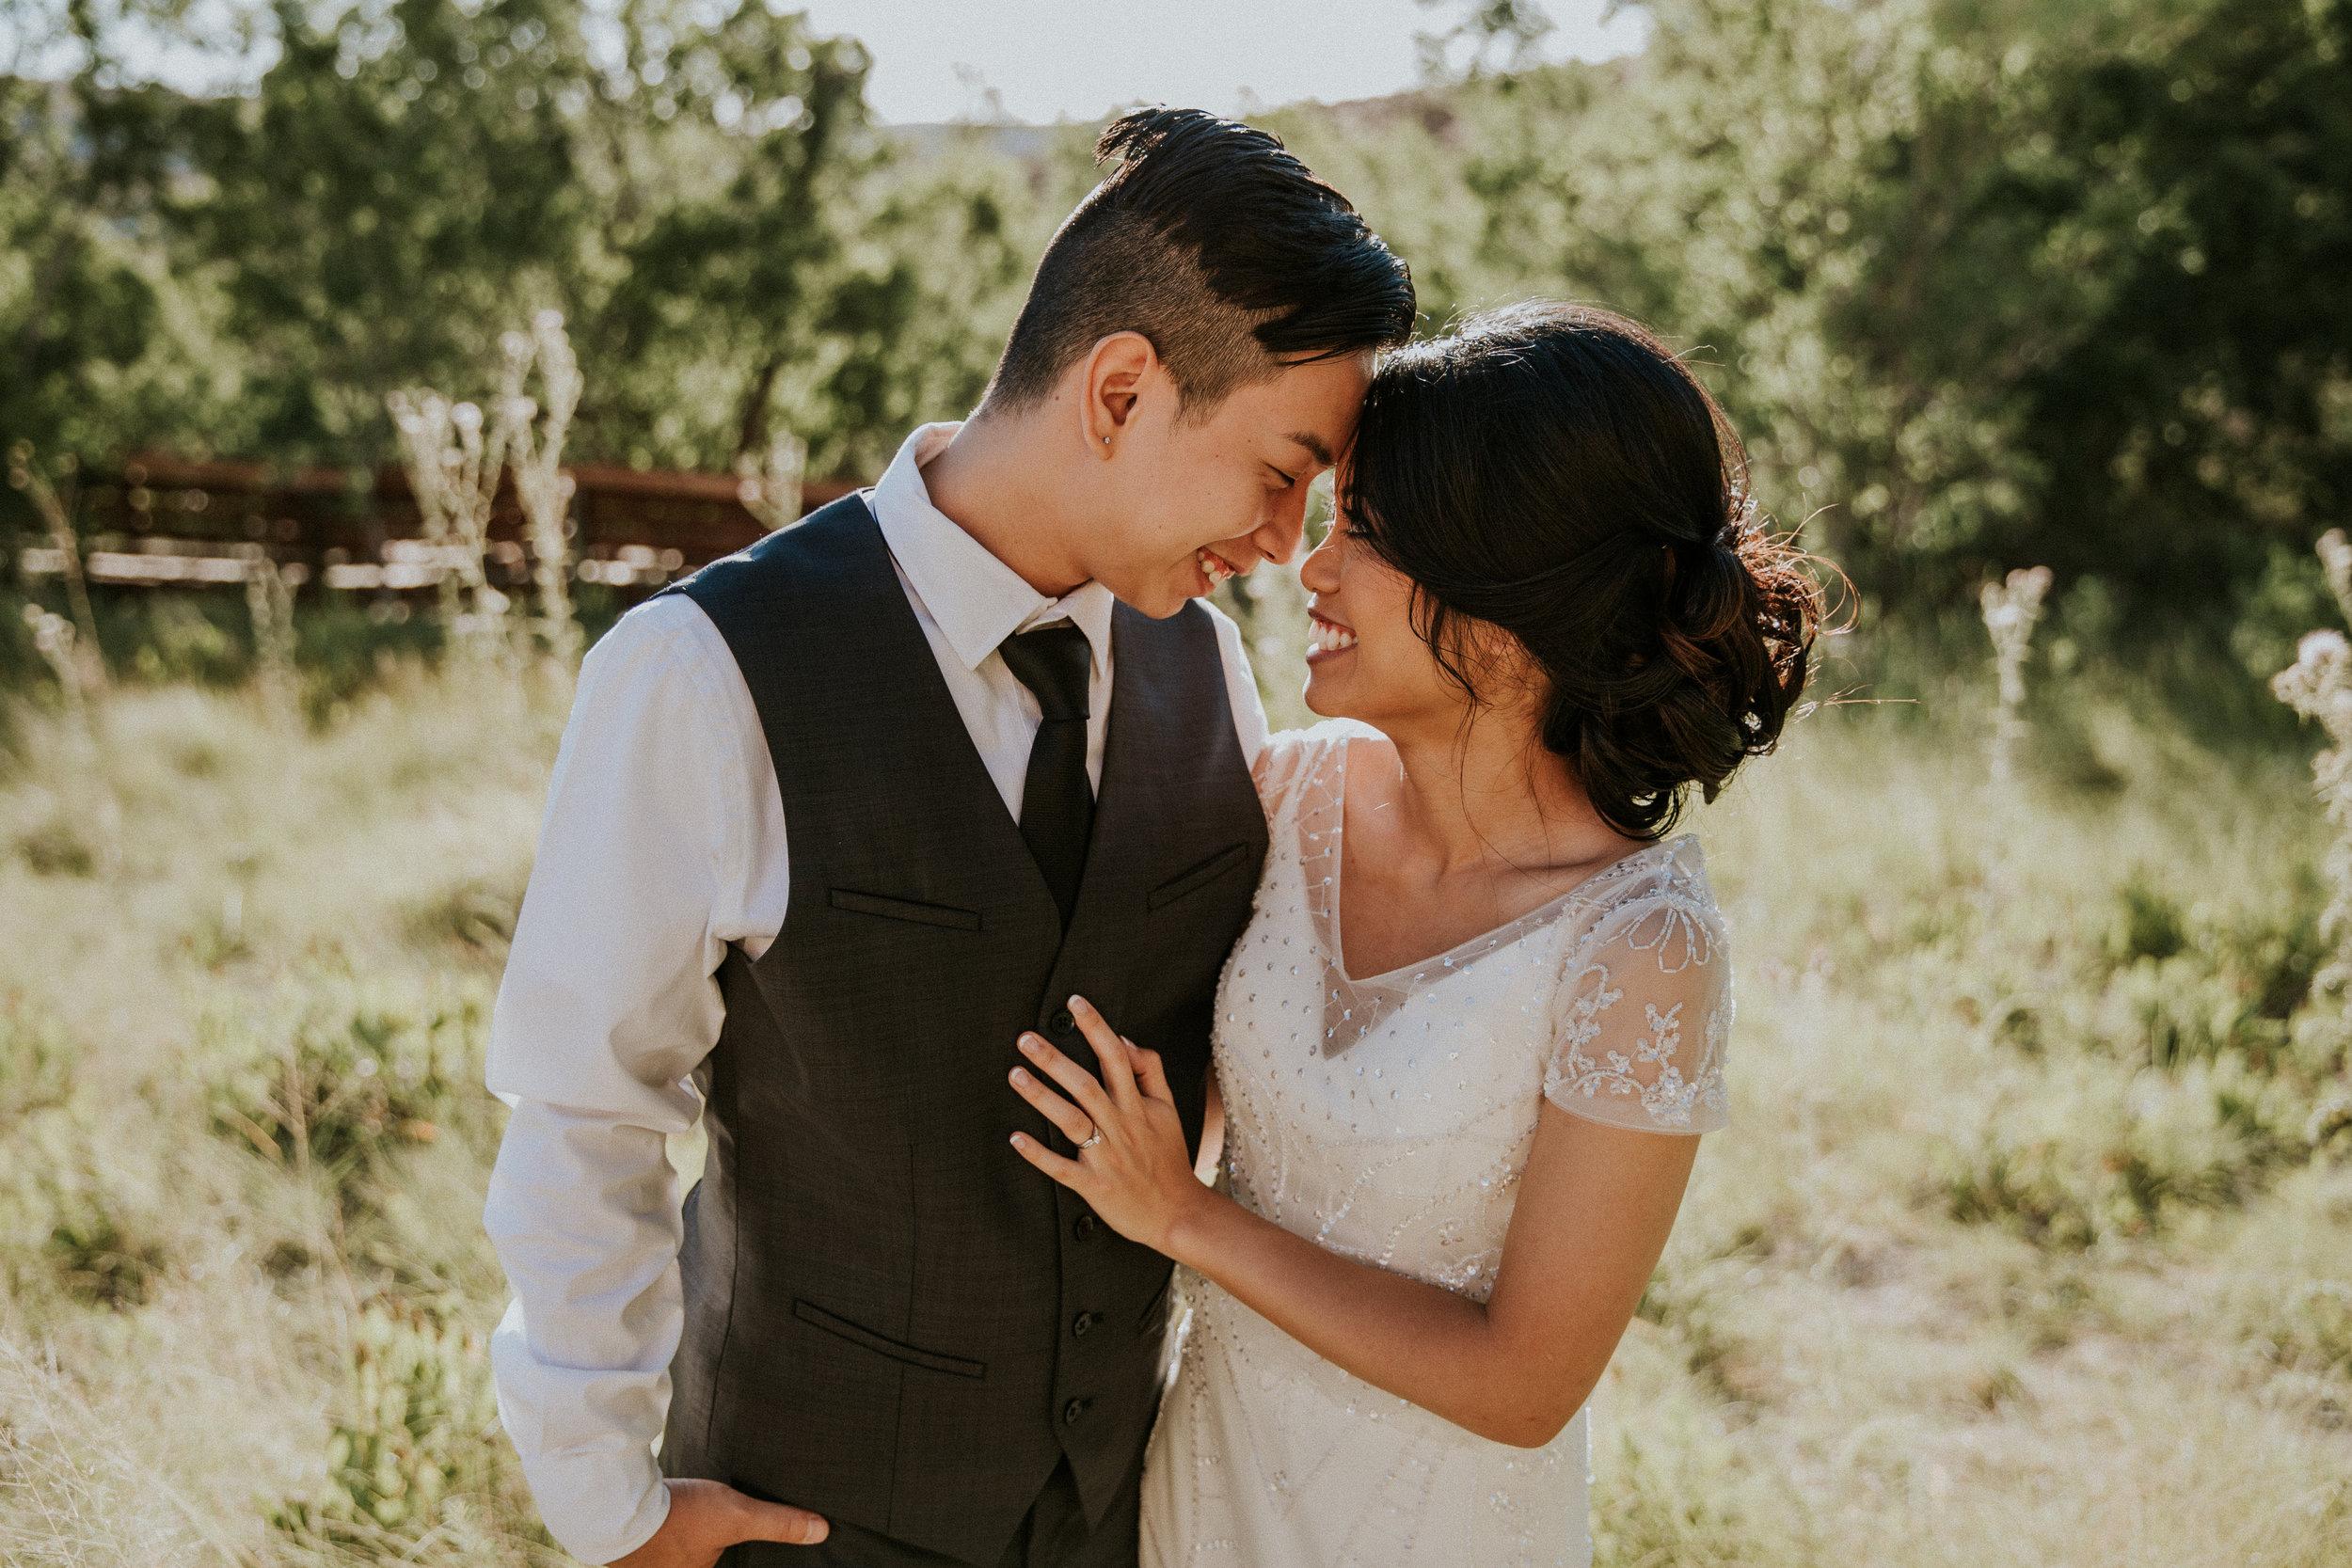 AJ + Kittichai - First Look - Wedding Day - Seattle Wedding Photographer - Washington Elopement Photographer - Seattle Engagement Photographer - Best Seattle Photographer